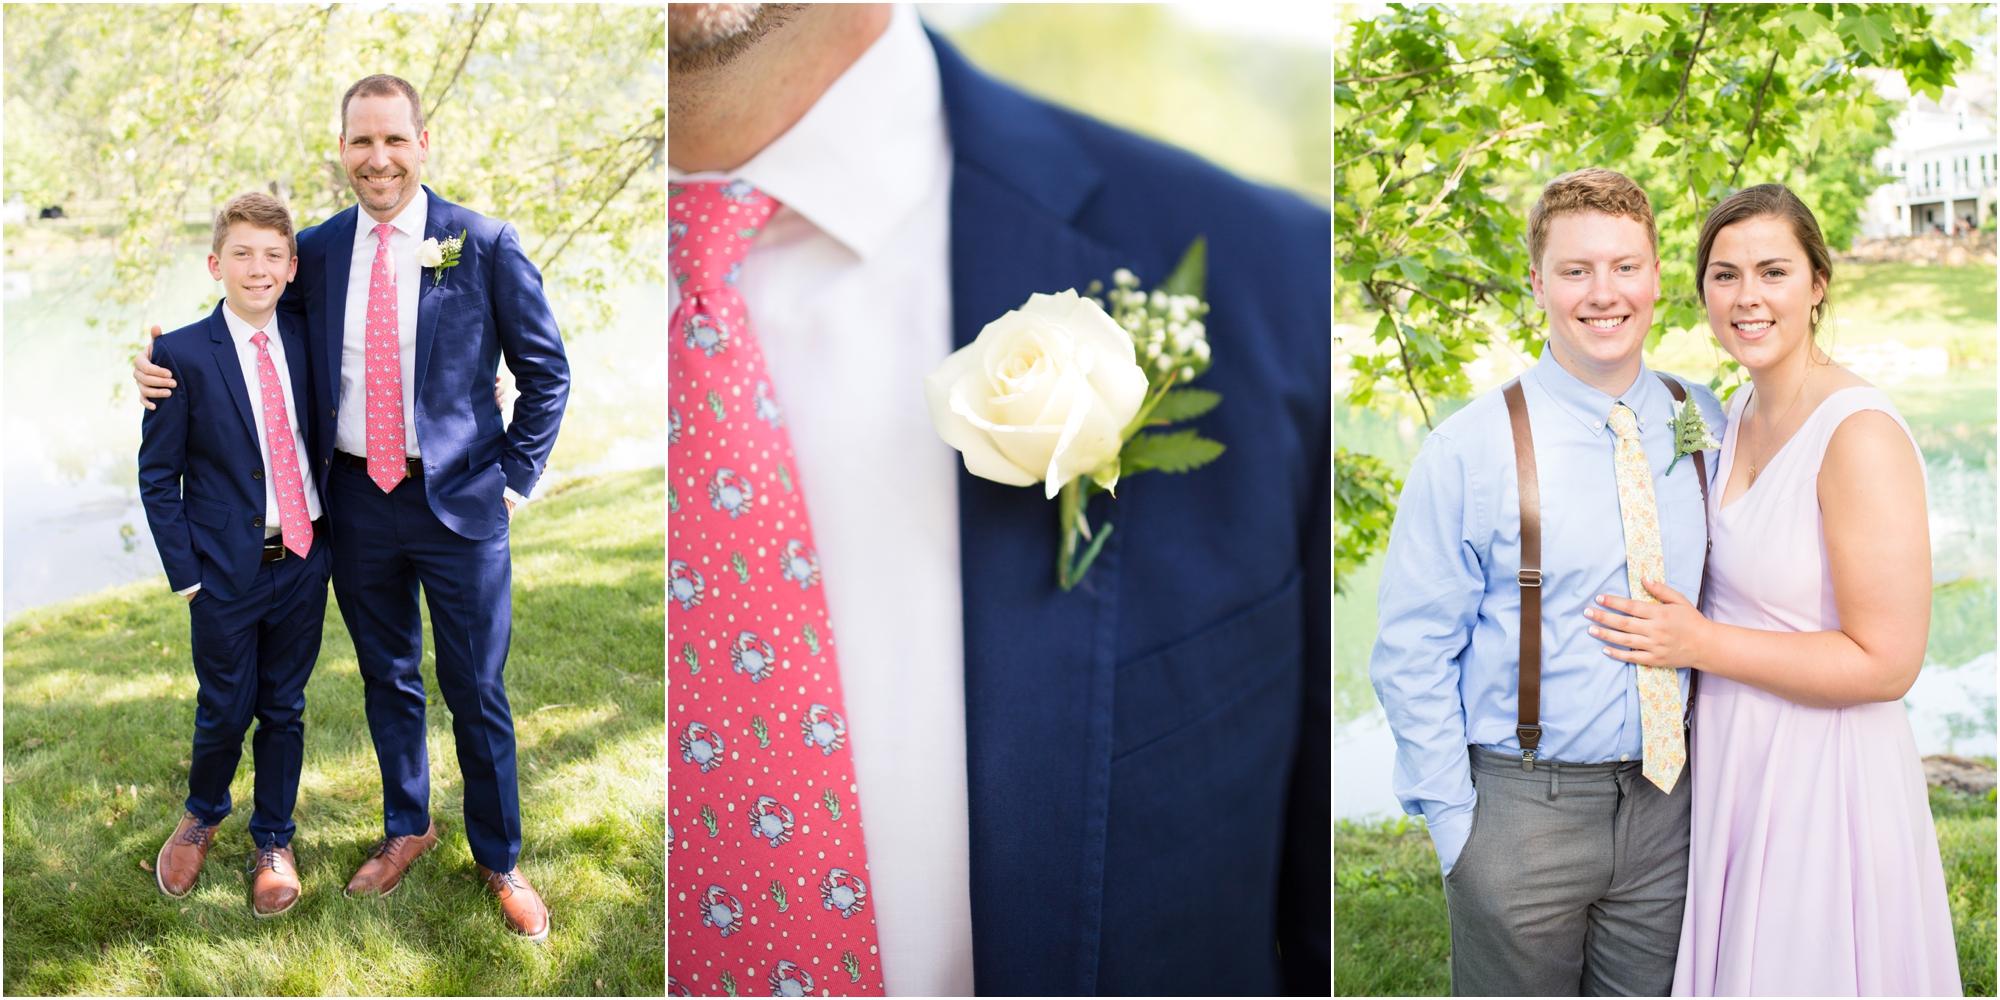 5-Rittler Wedding Family Formals-353.jpg